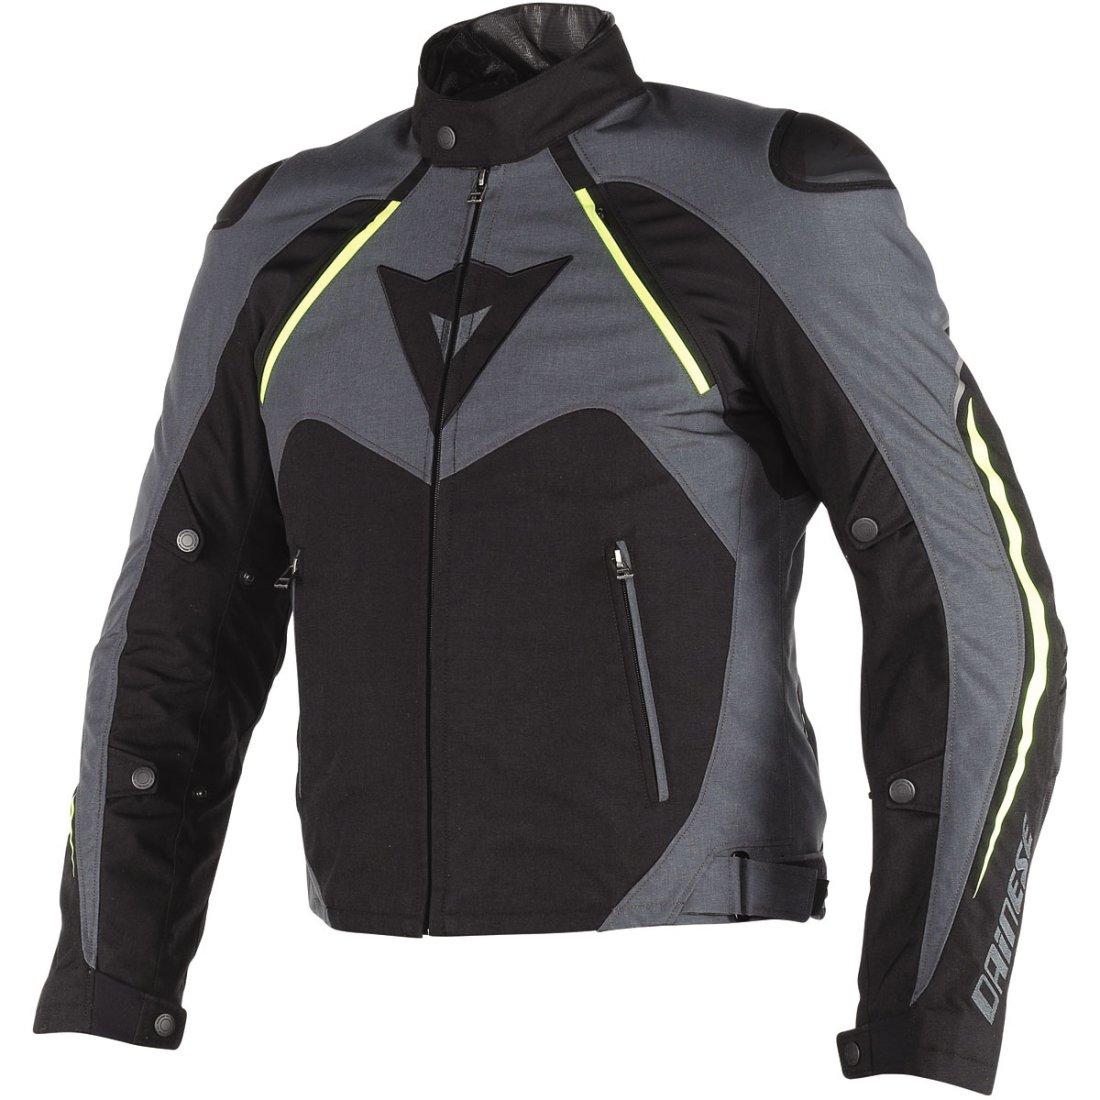 DAINESE Hawker D-Dry Black / Ebony / Fluo-Yellow Jacket